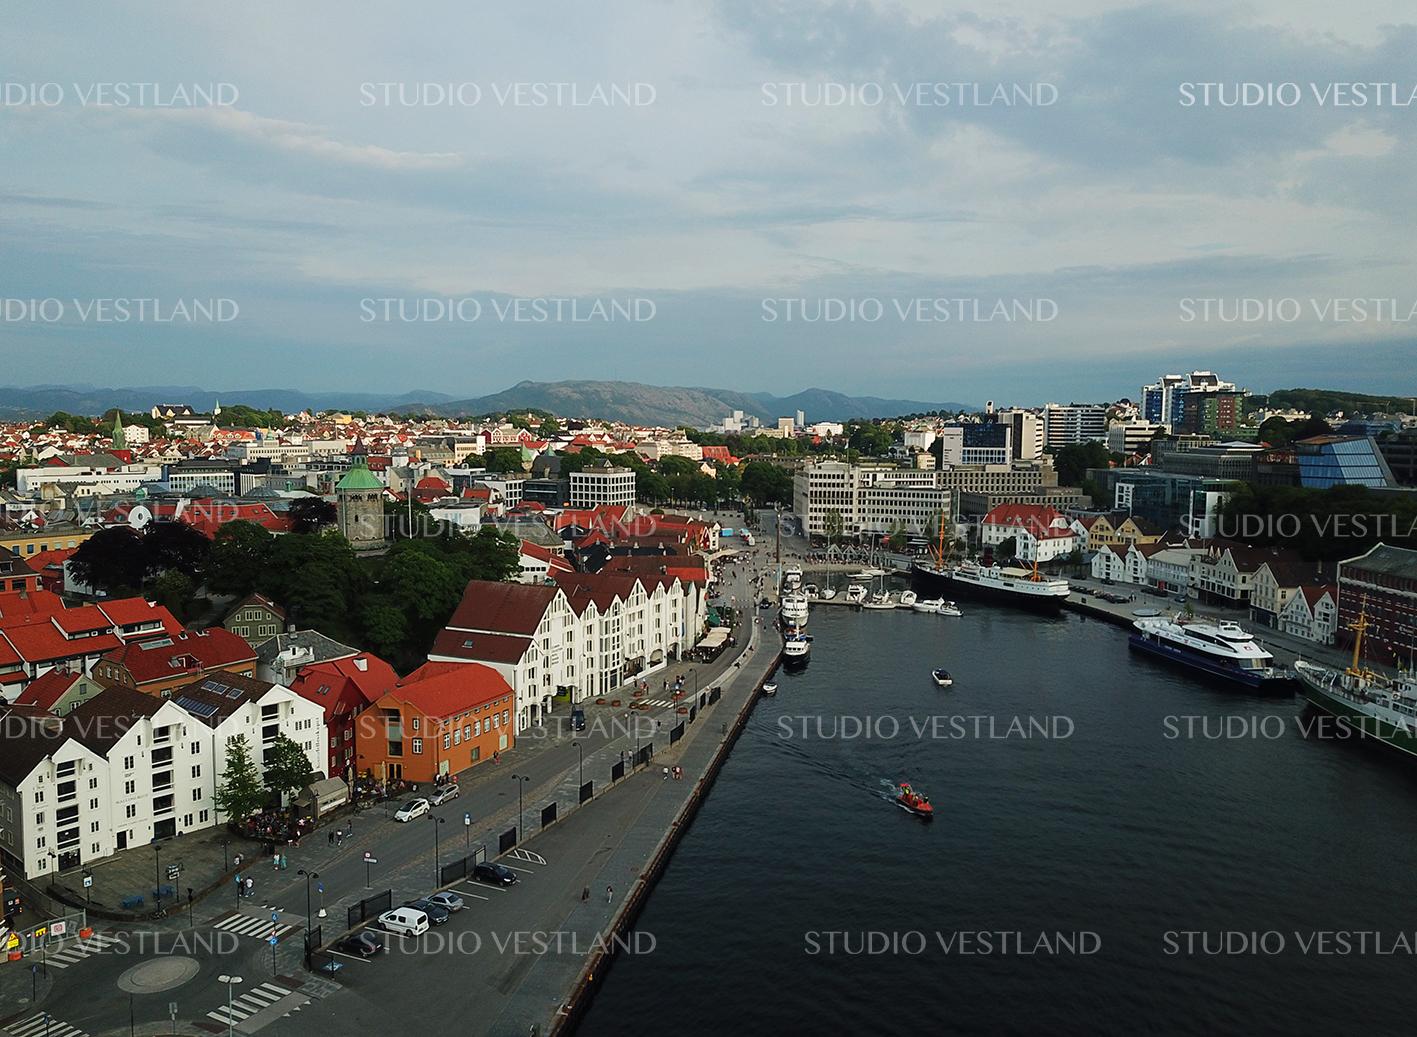 Studio Vestland - Stavanger 28